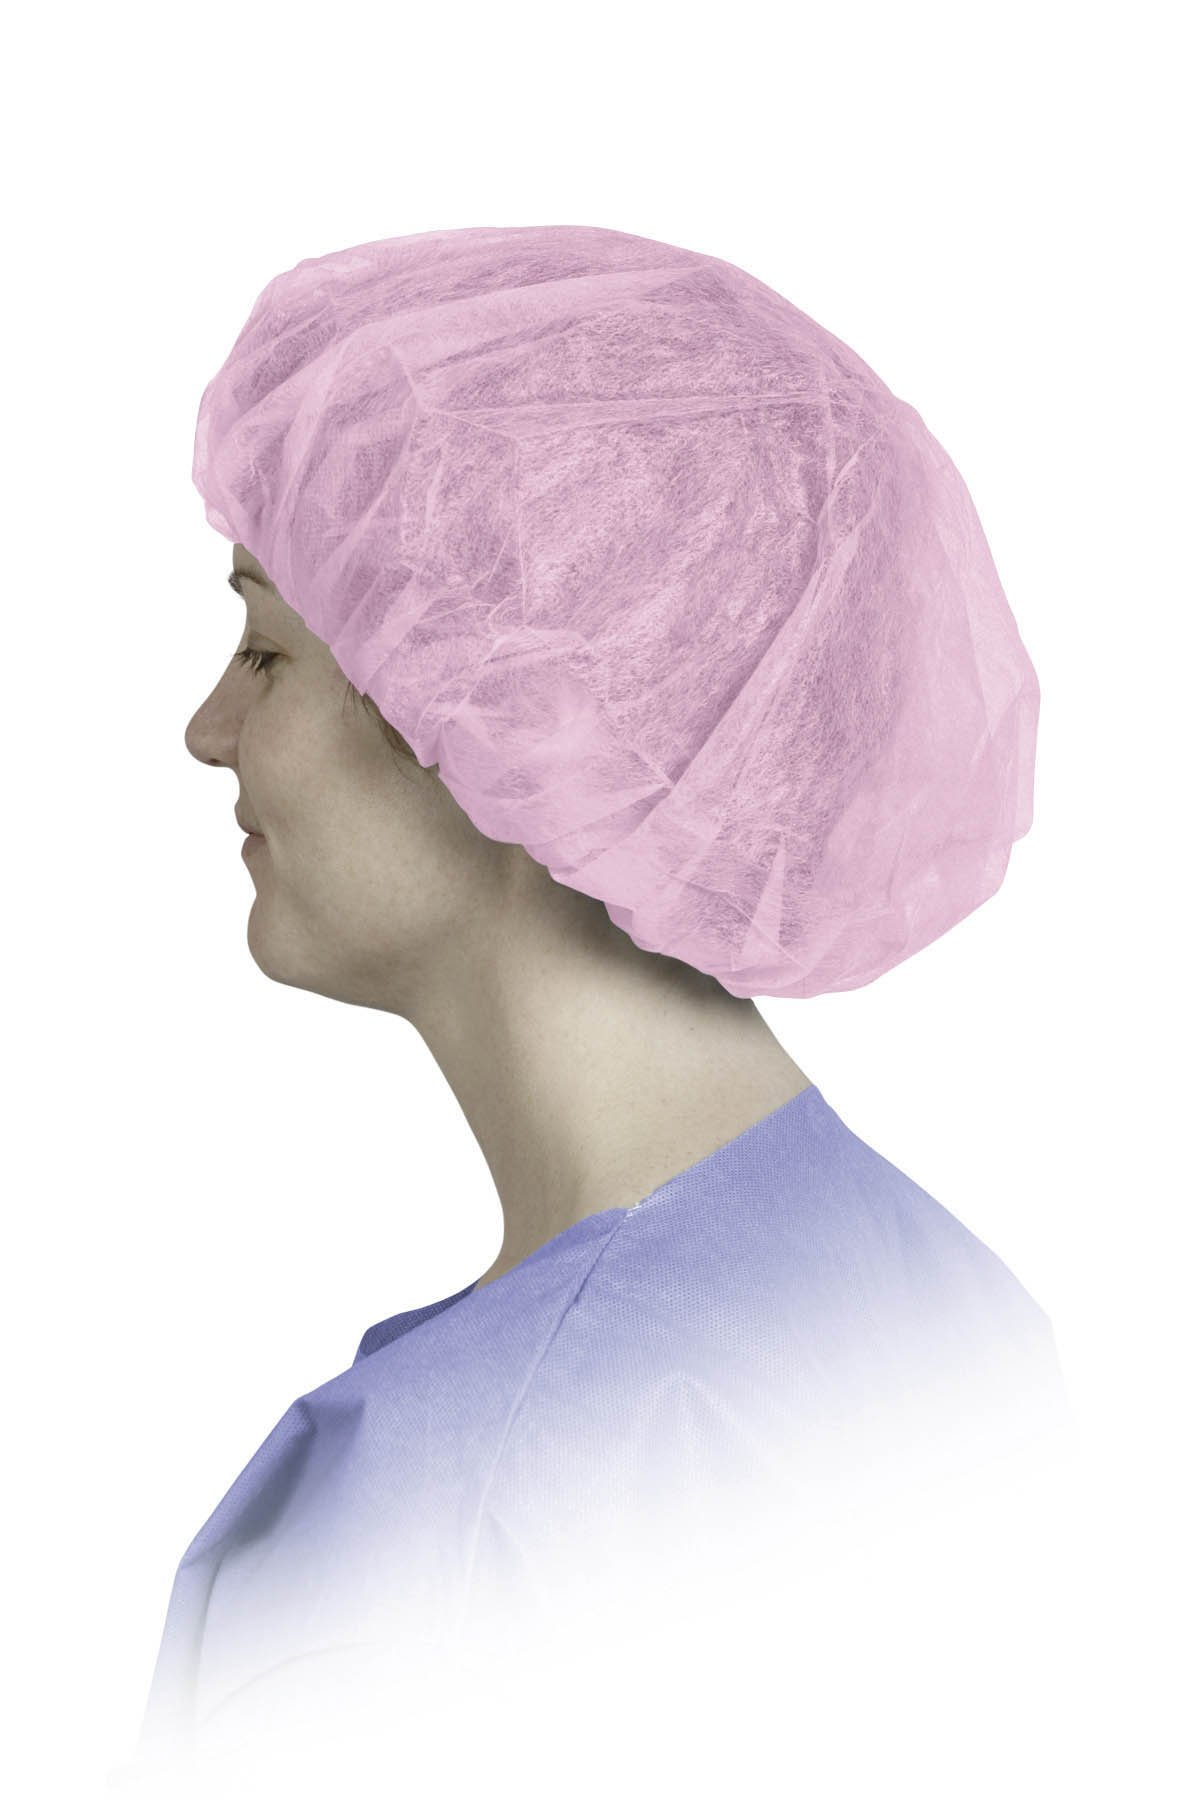 Medline CRI1008 Single Ply Polypropylene Bouffant Caps, Latex Free, Regular/Large, Pink (Pack of 500) by Medline